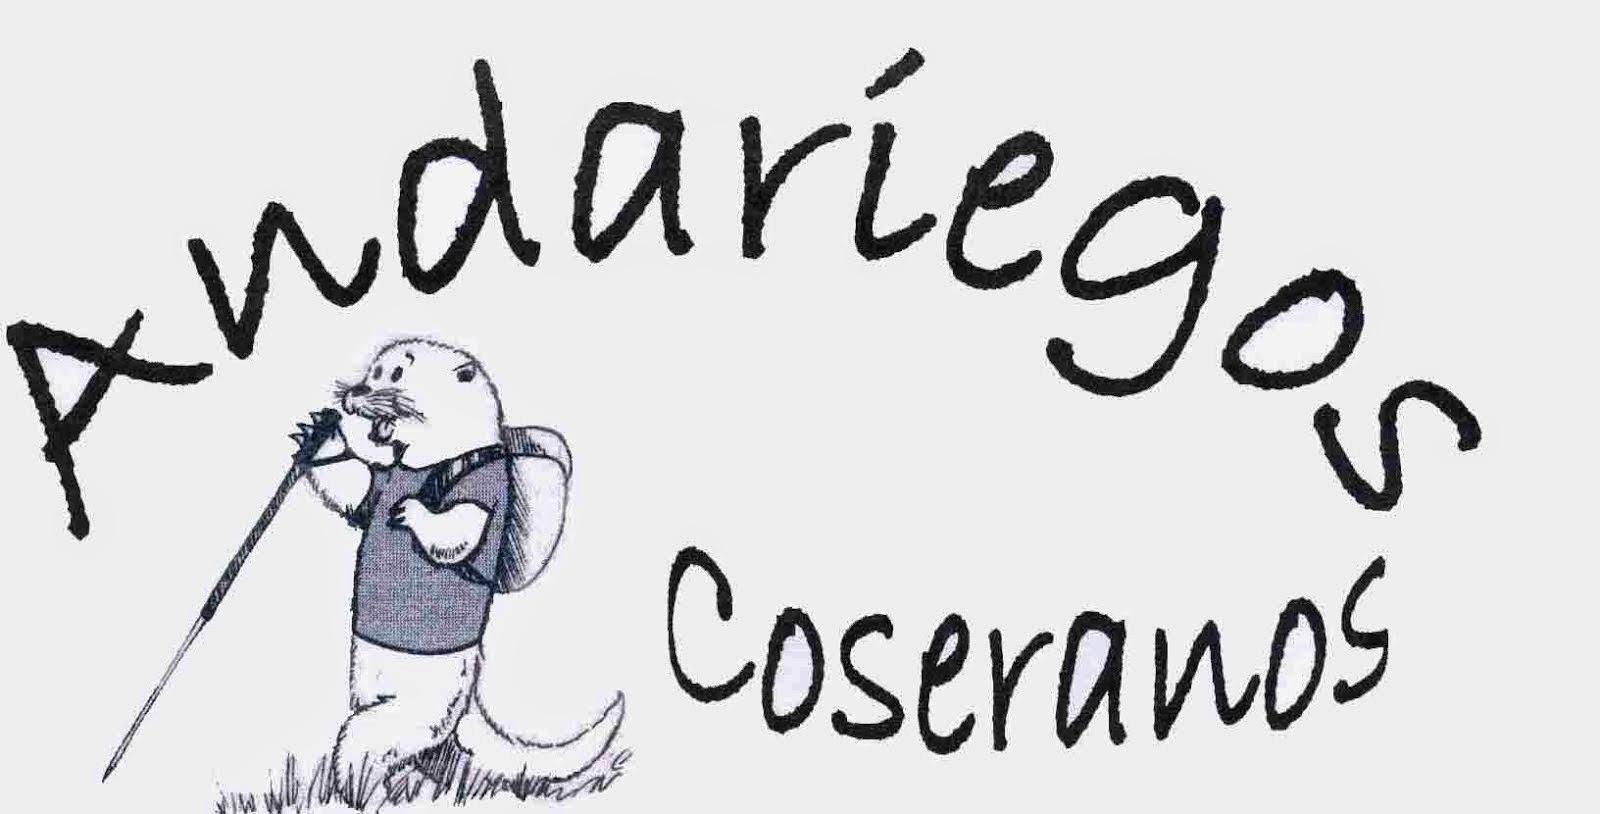 Andariegos Coseranos